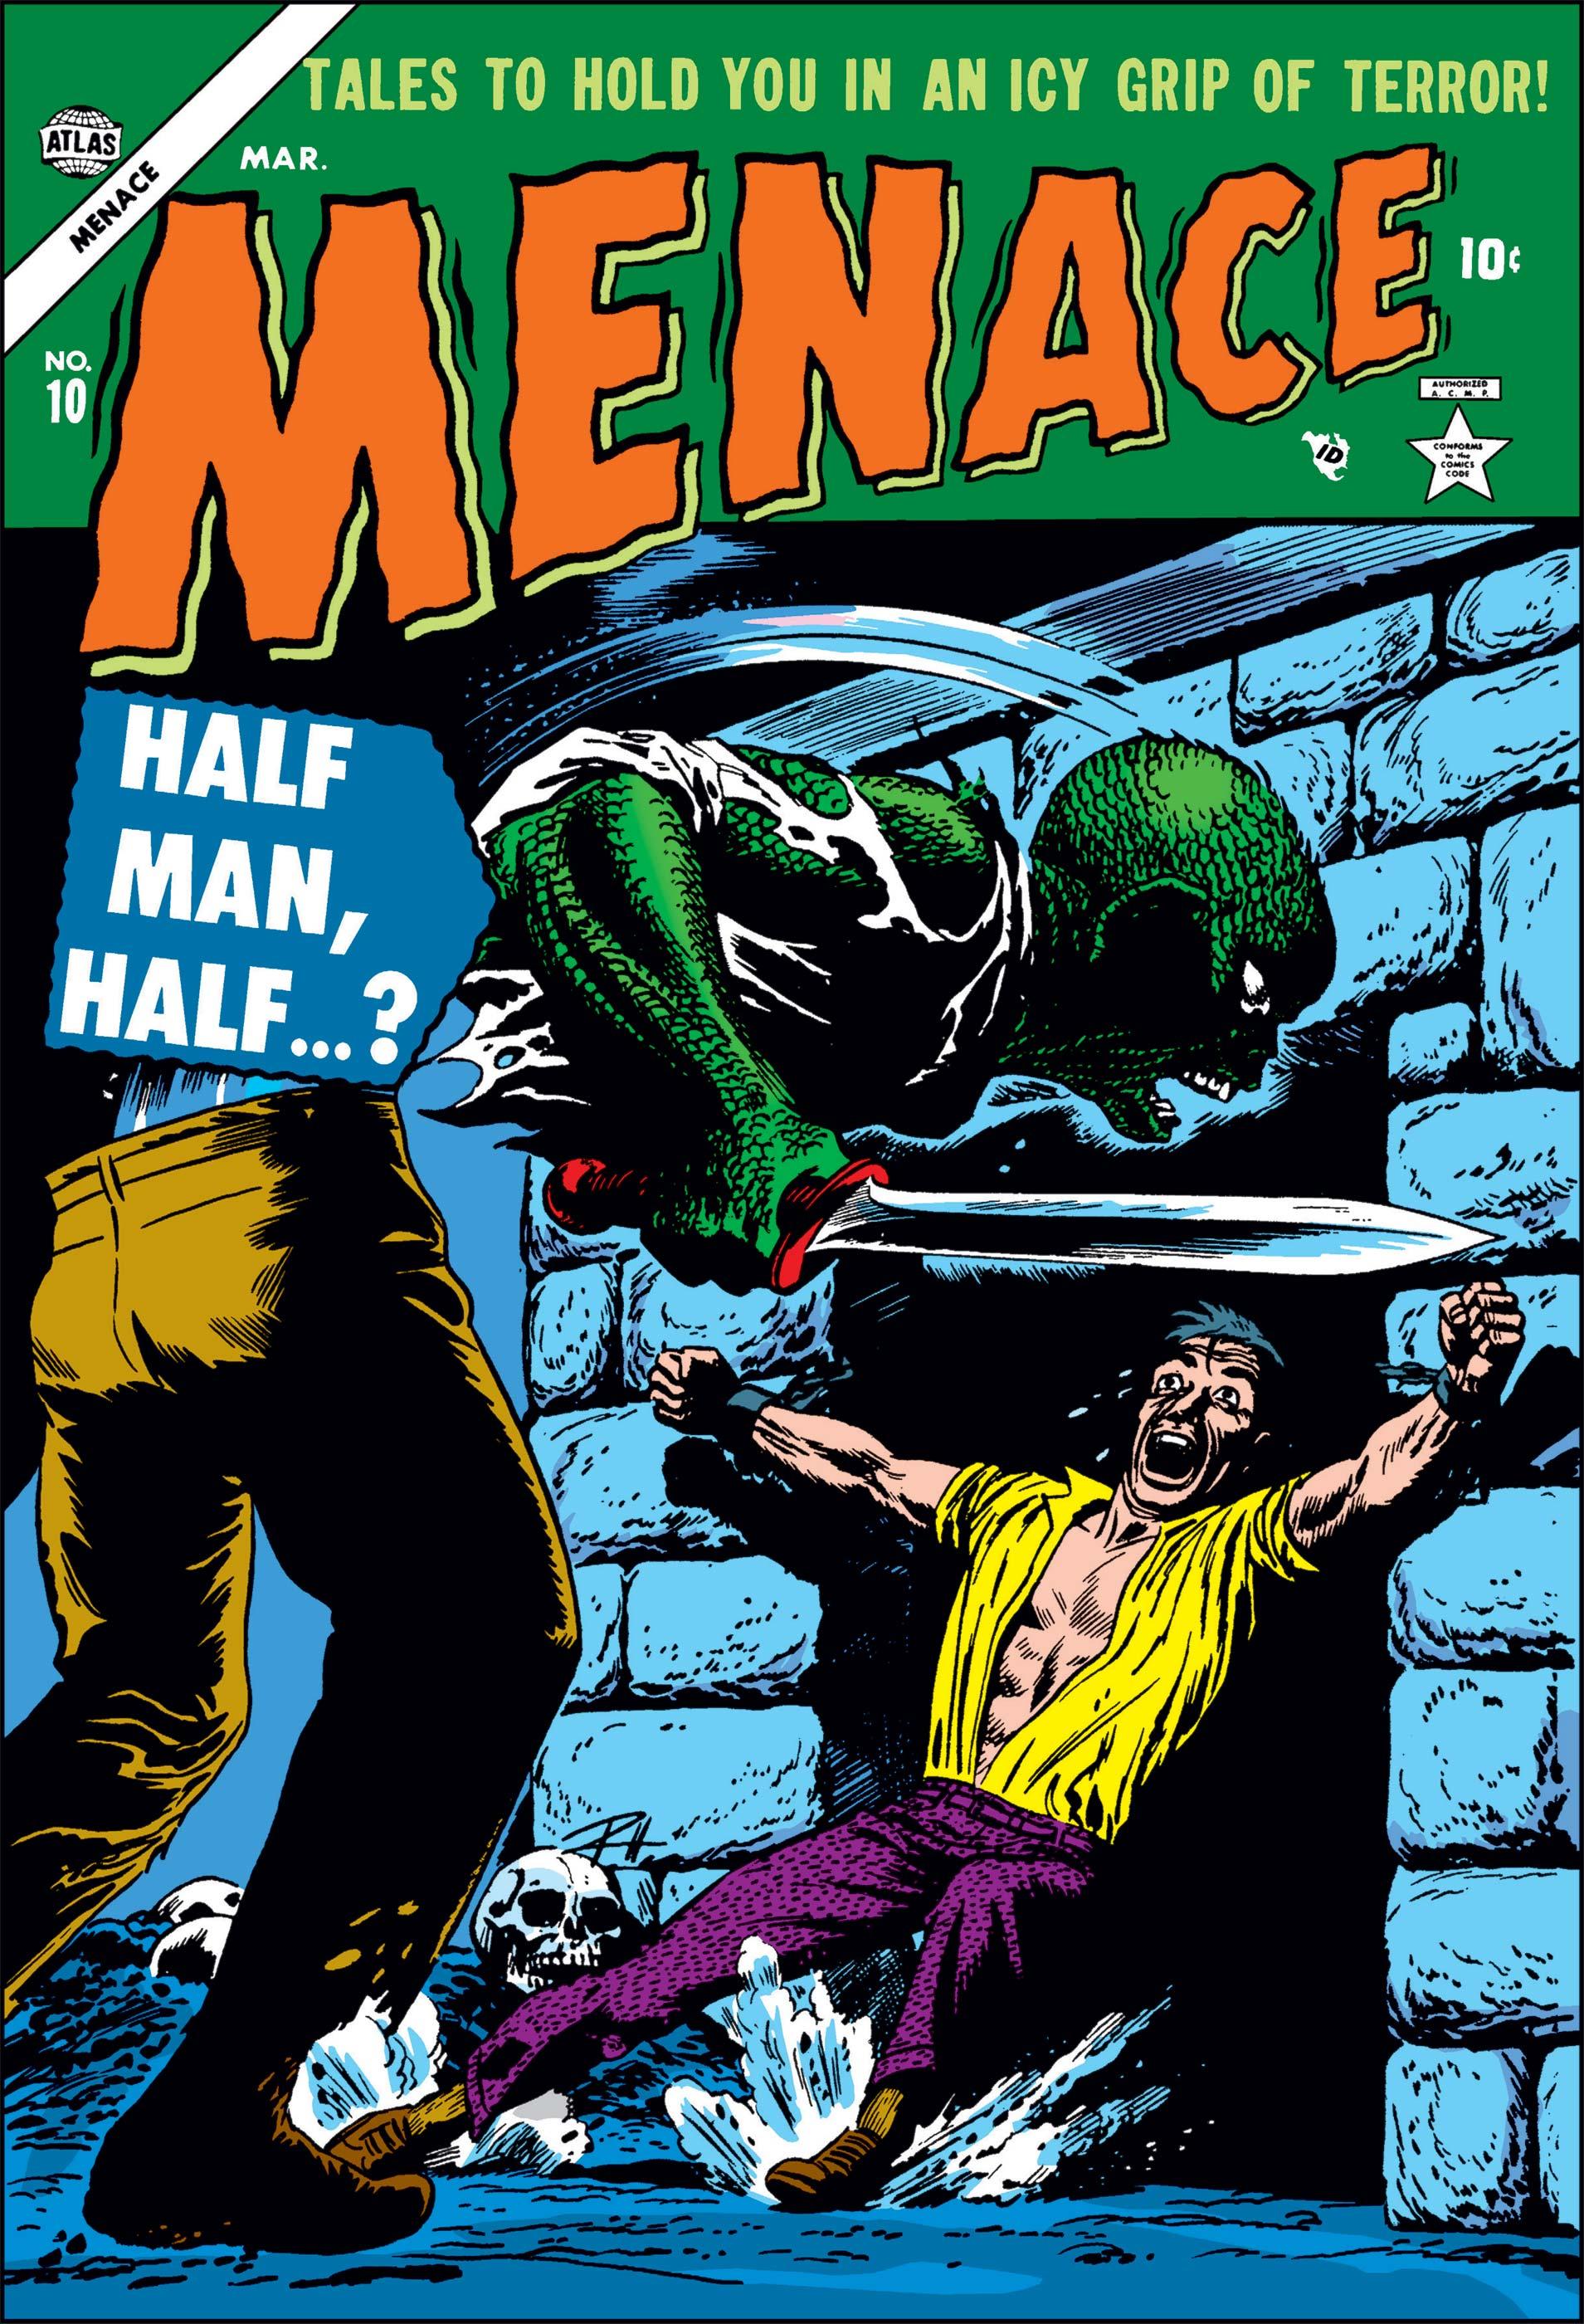 Menace (1953) #10